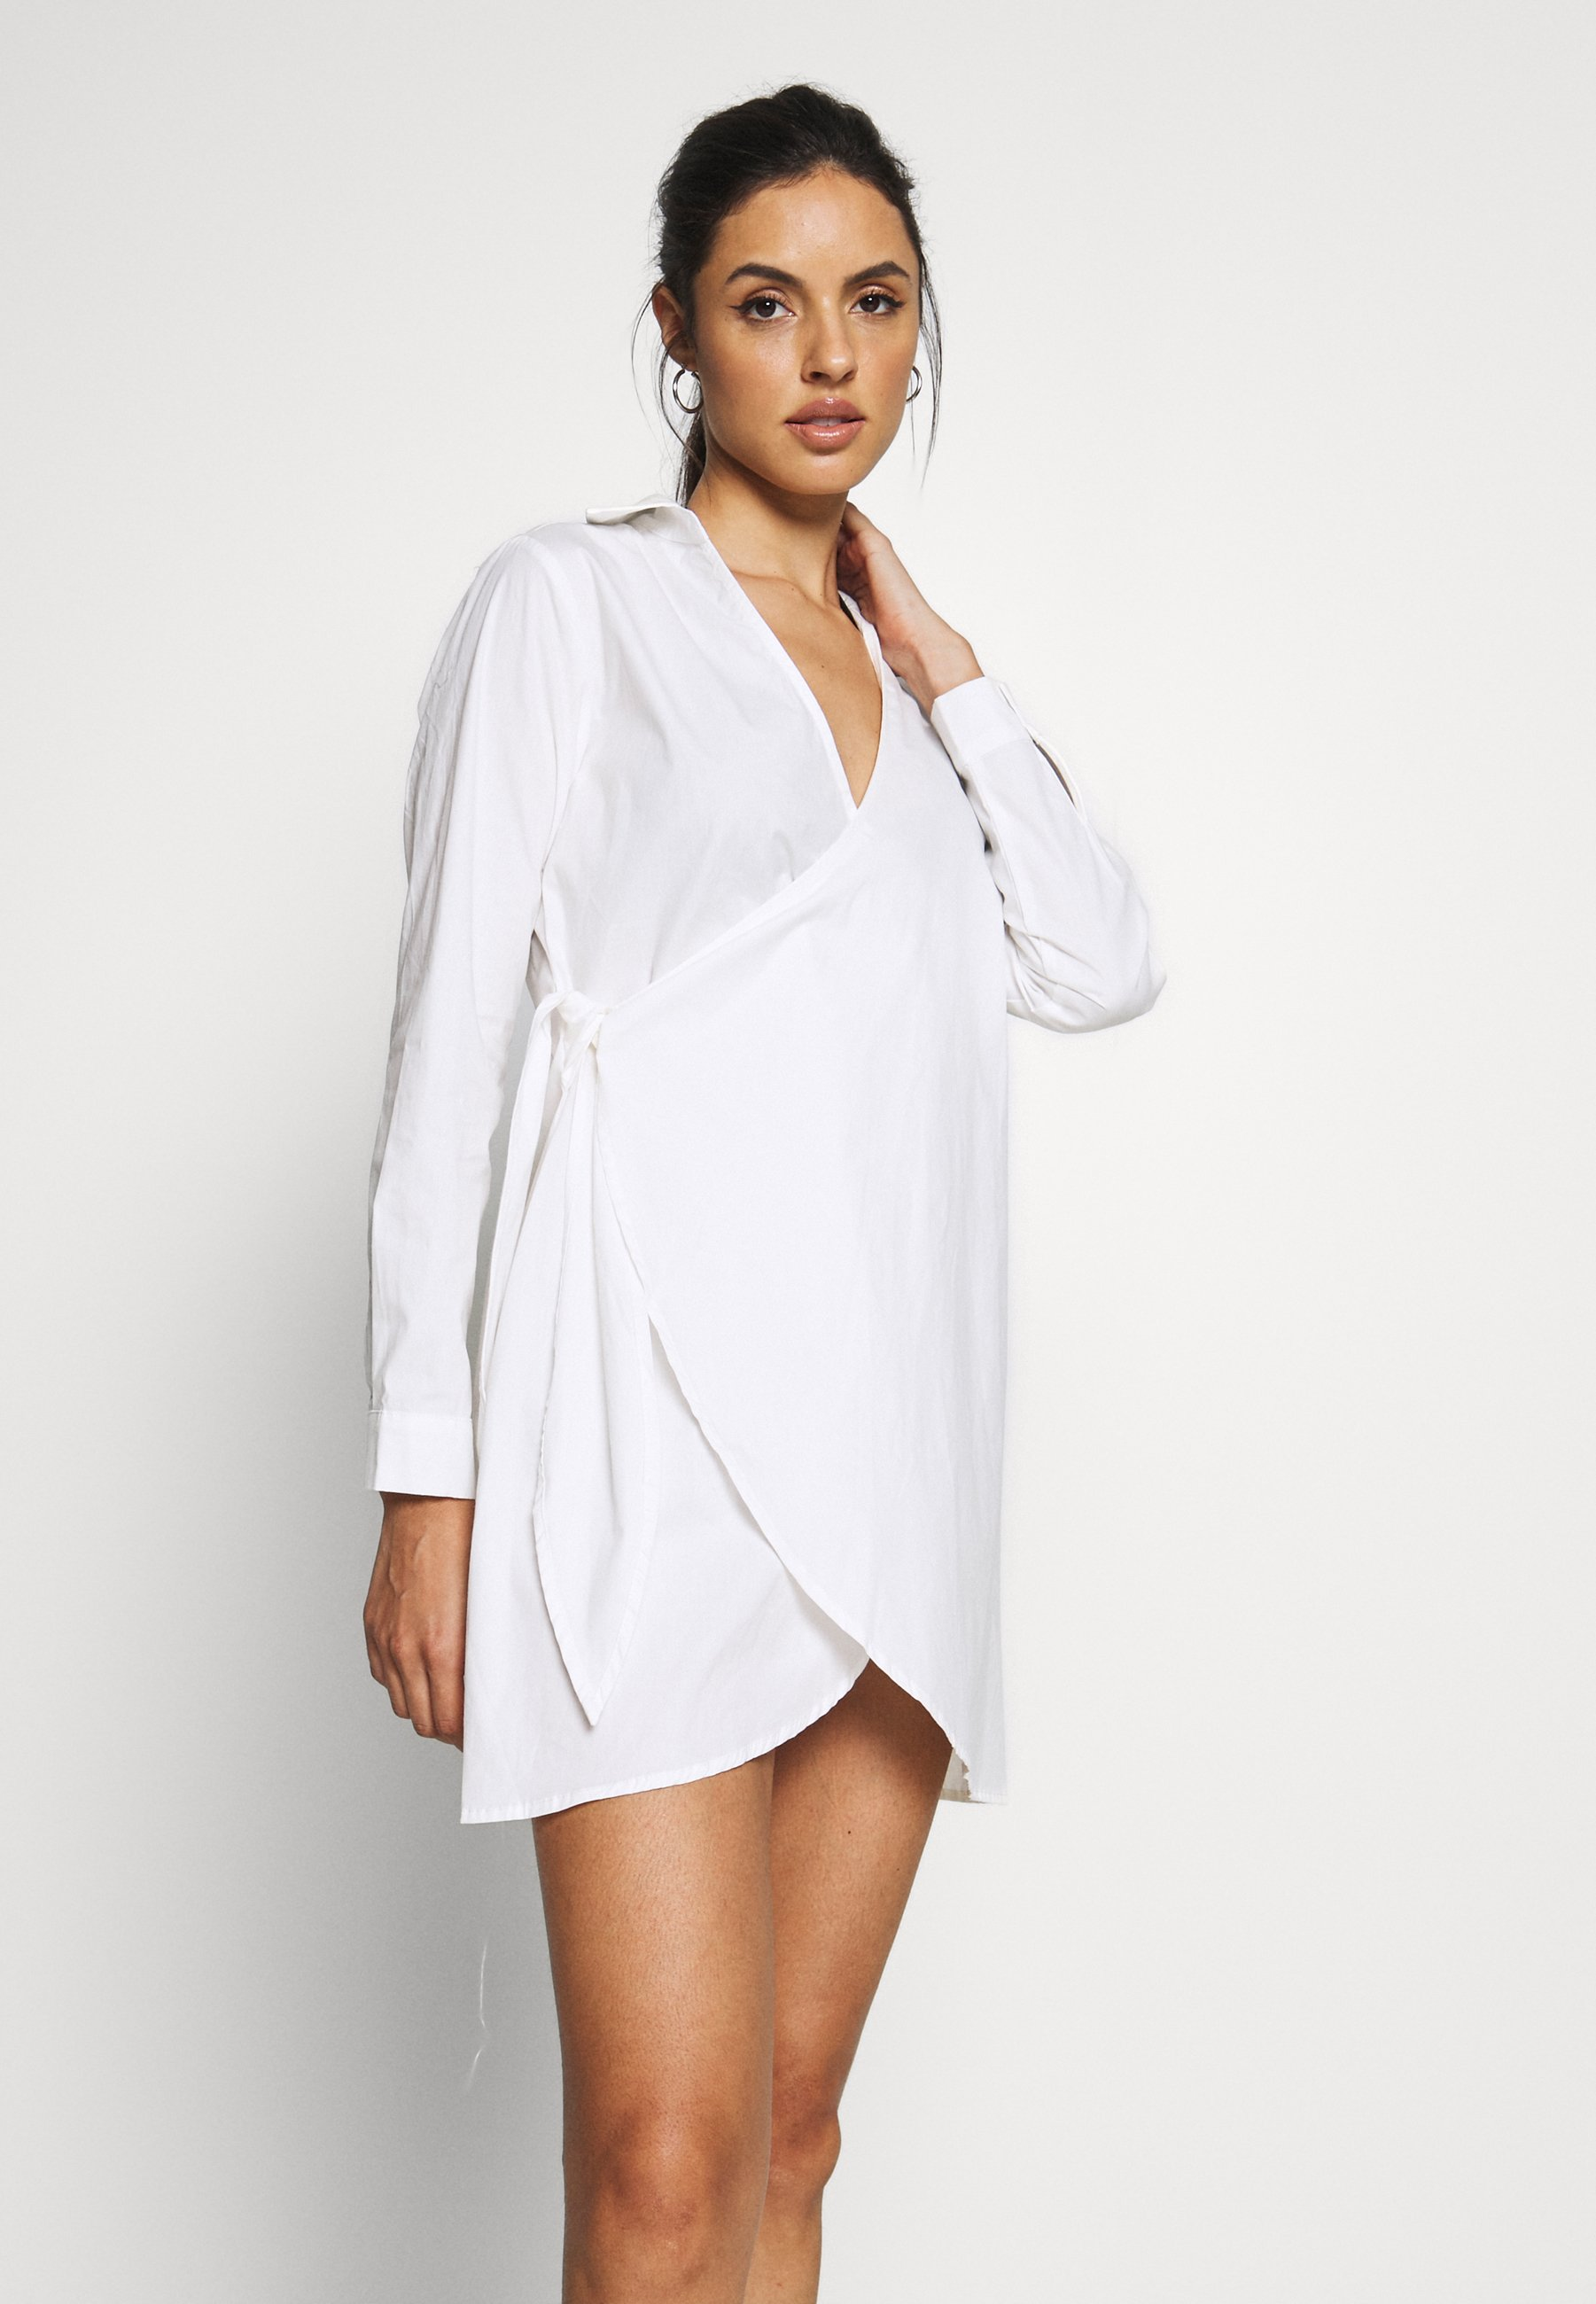 Missguided Wrap Dress Swim Cover Up Beach Accessory White Zalando Co Uk